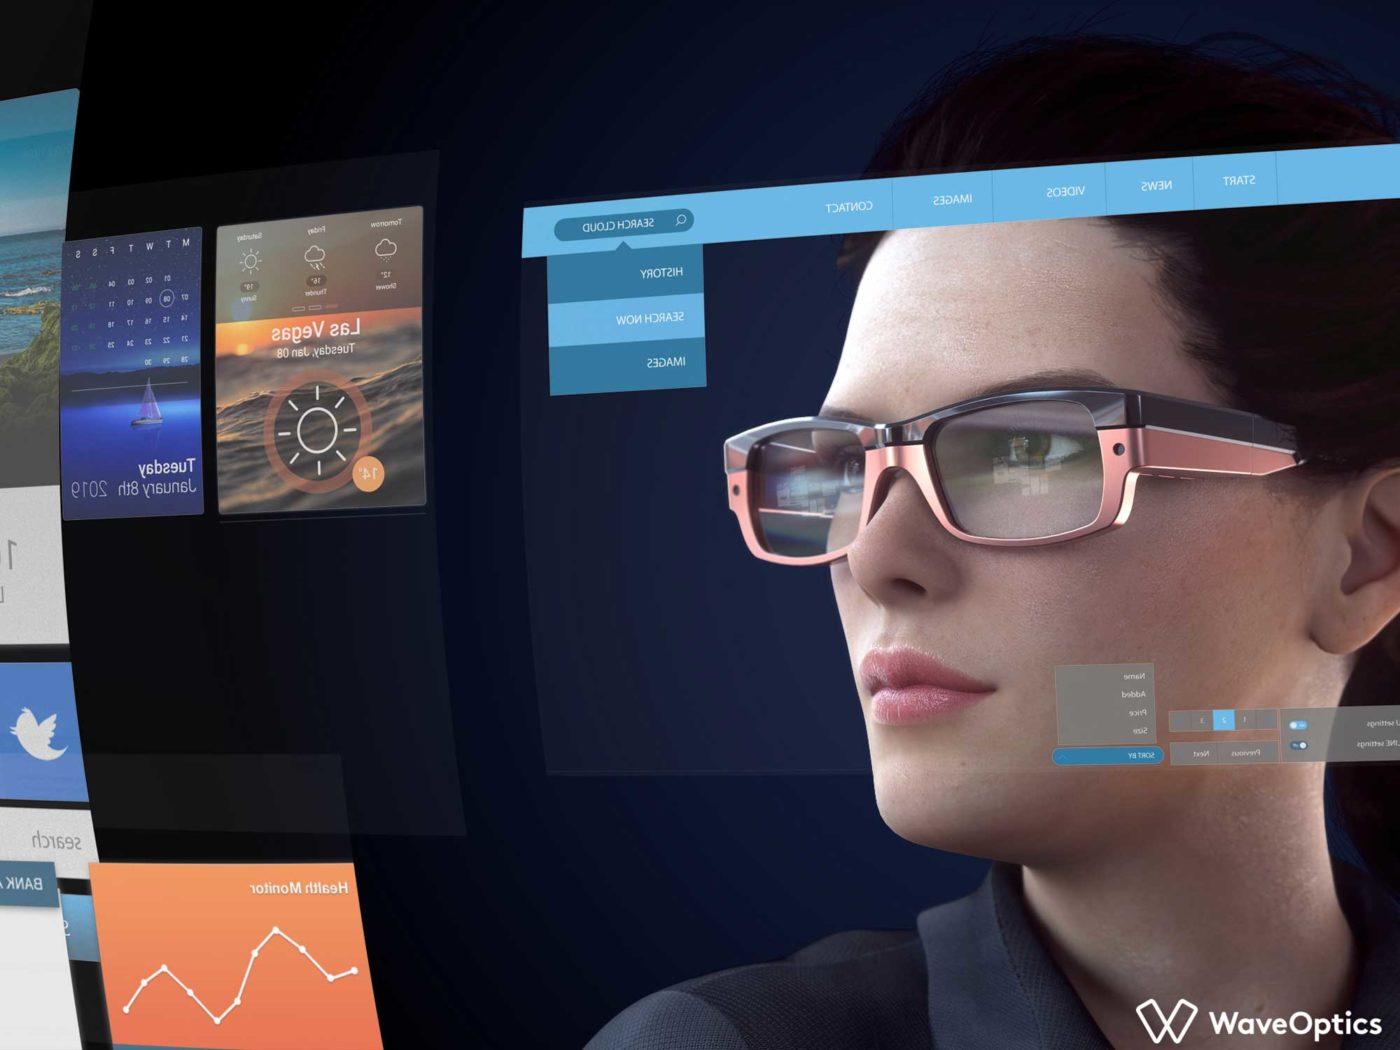 WaveOptics Augmented Reality Displays